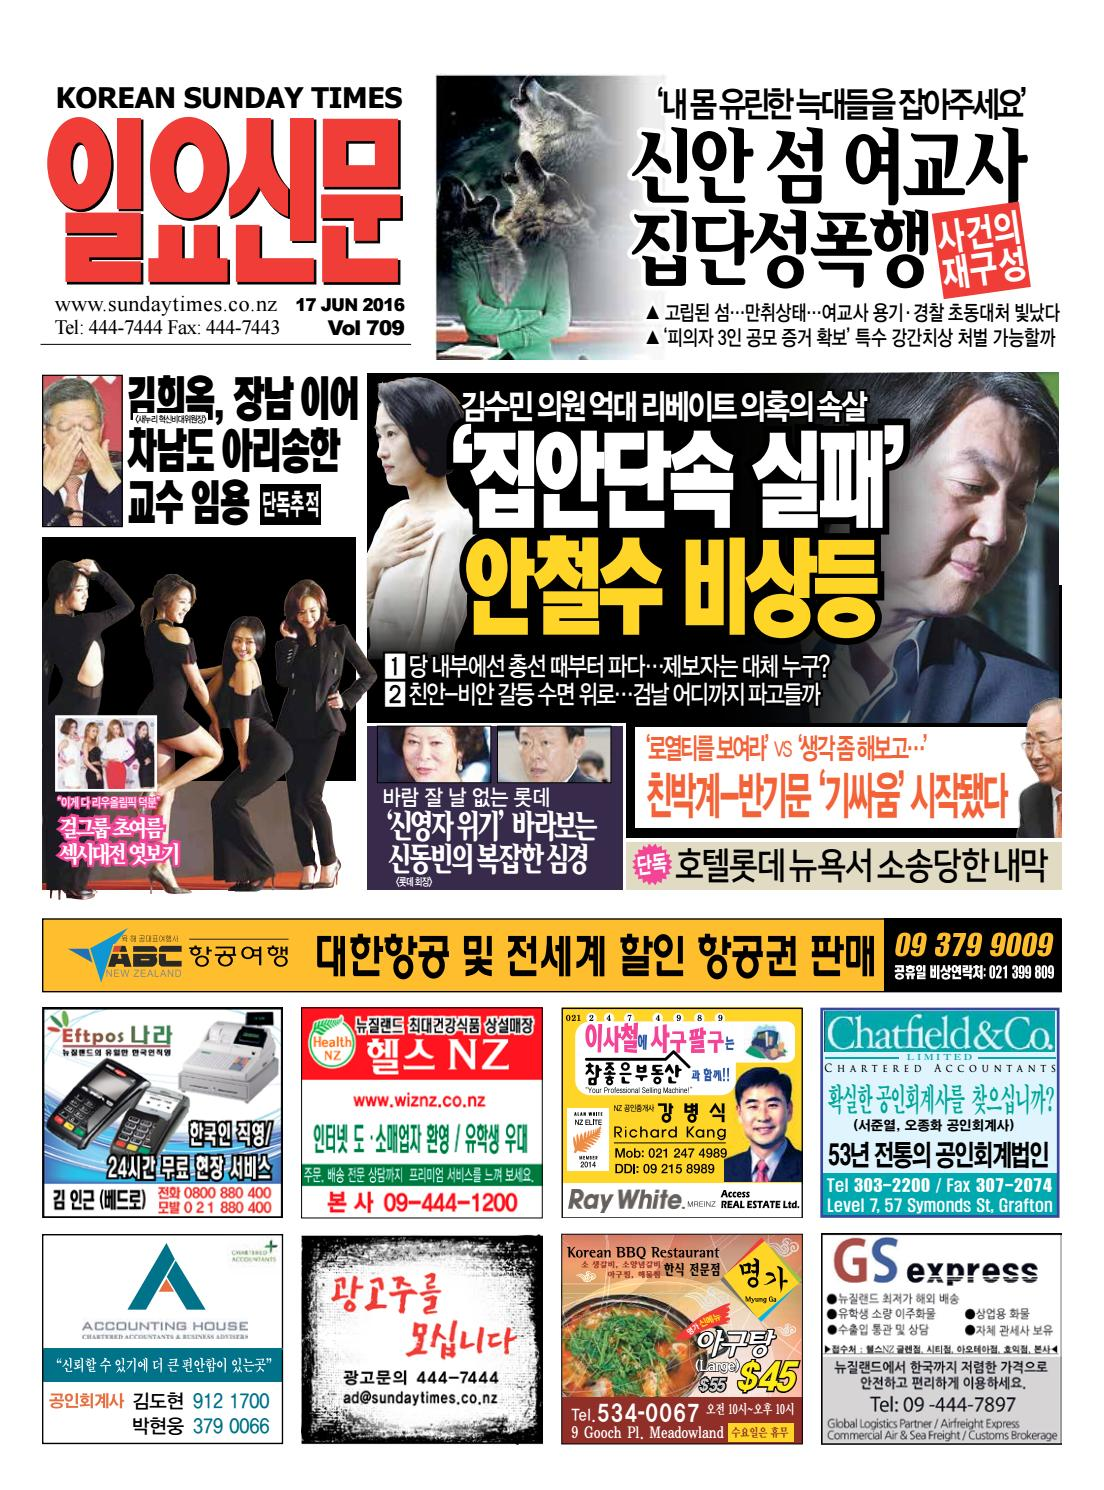 Vol 15 15 jun 15 by New Zealand Korean Sunday Times   issuu